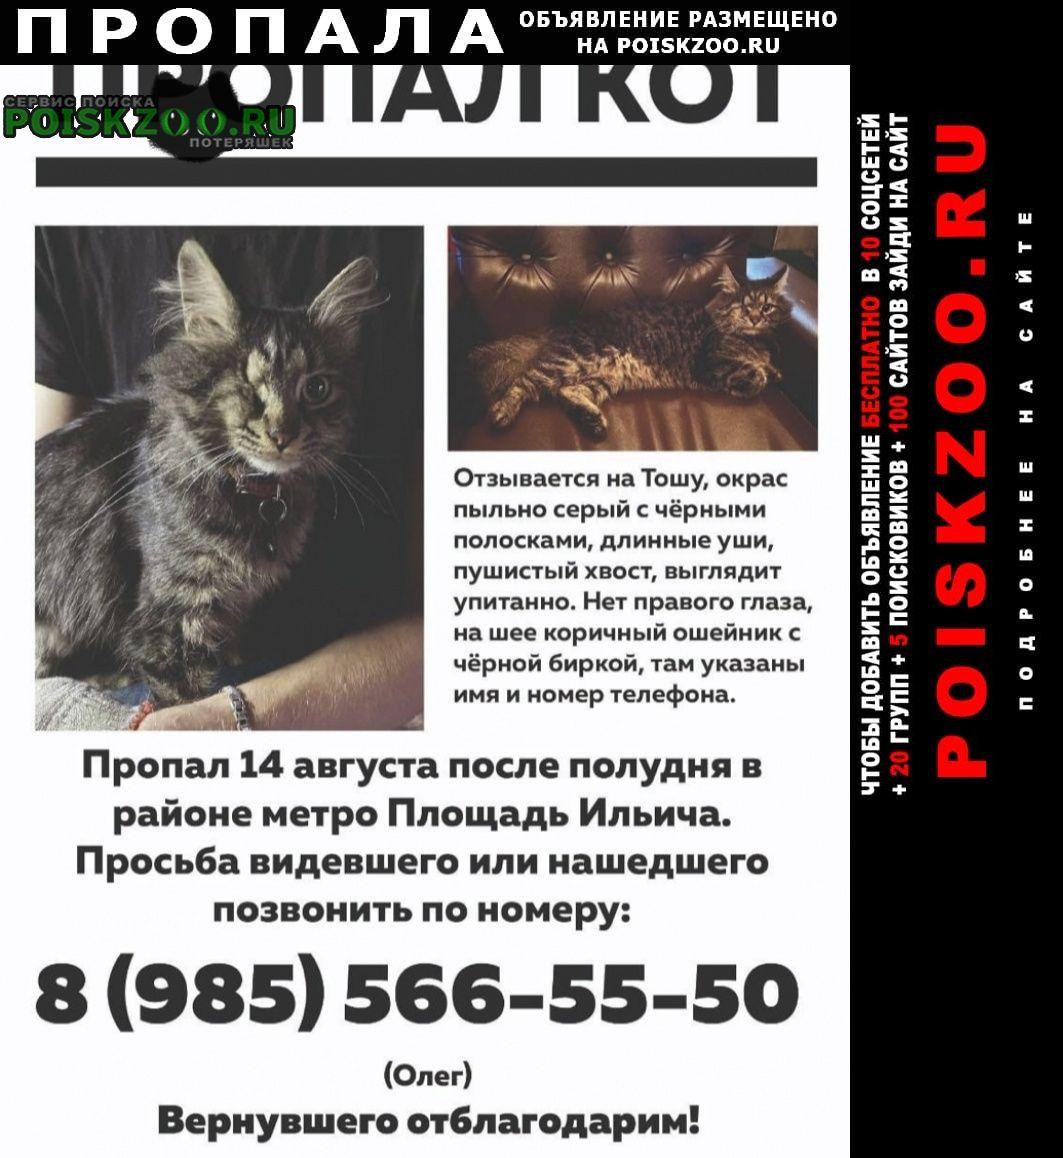 Пропал кот. Москва